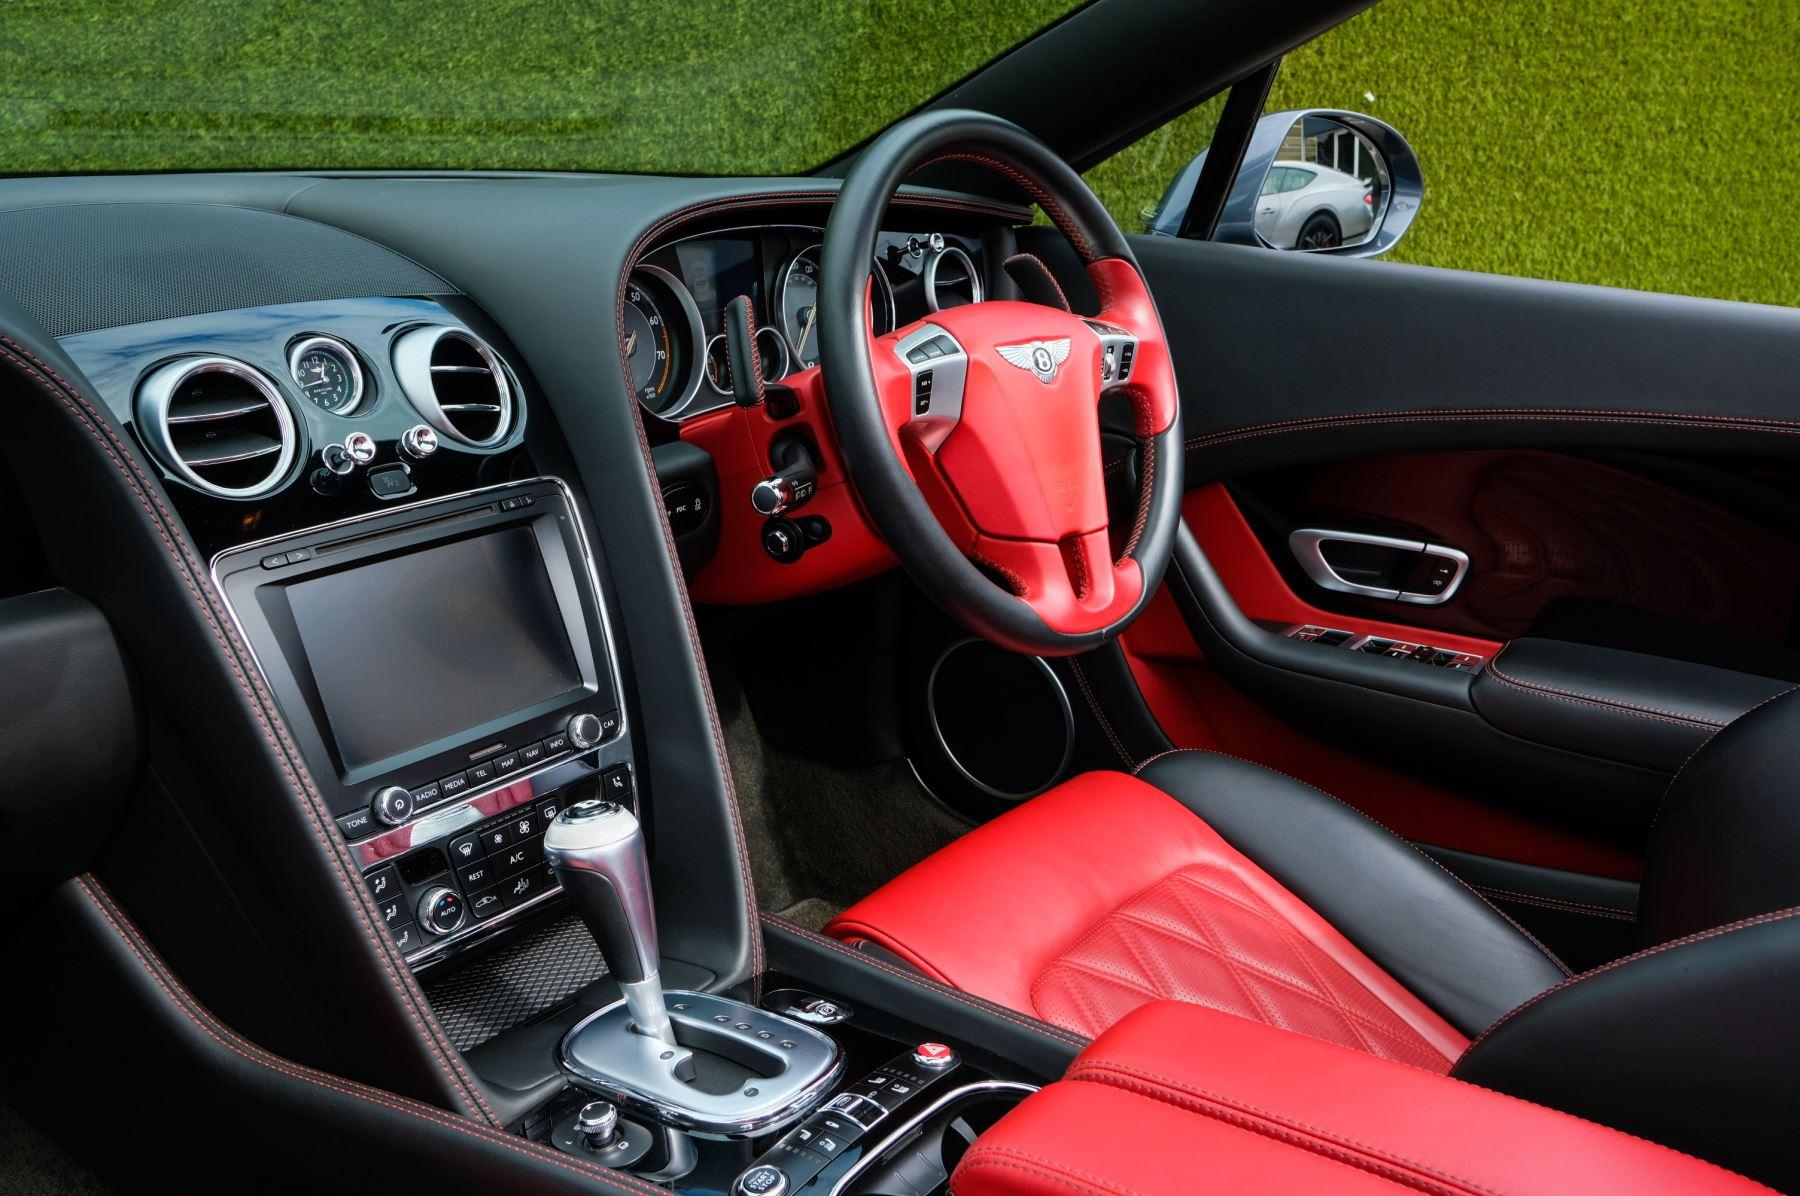 Bentley Continental GTC 6.0 W12 Speed - Massage Seats & Ventilation - Neck Warmer - Rear View Camera image 10